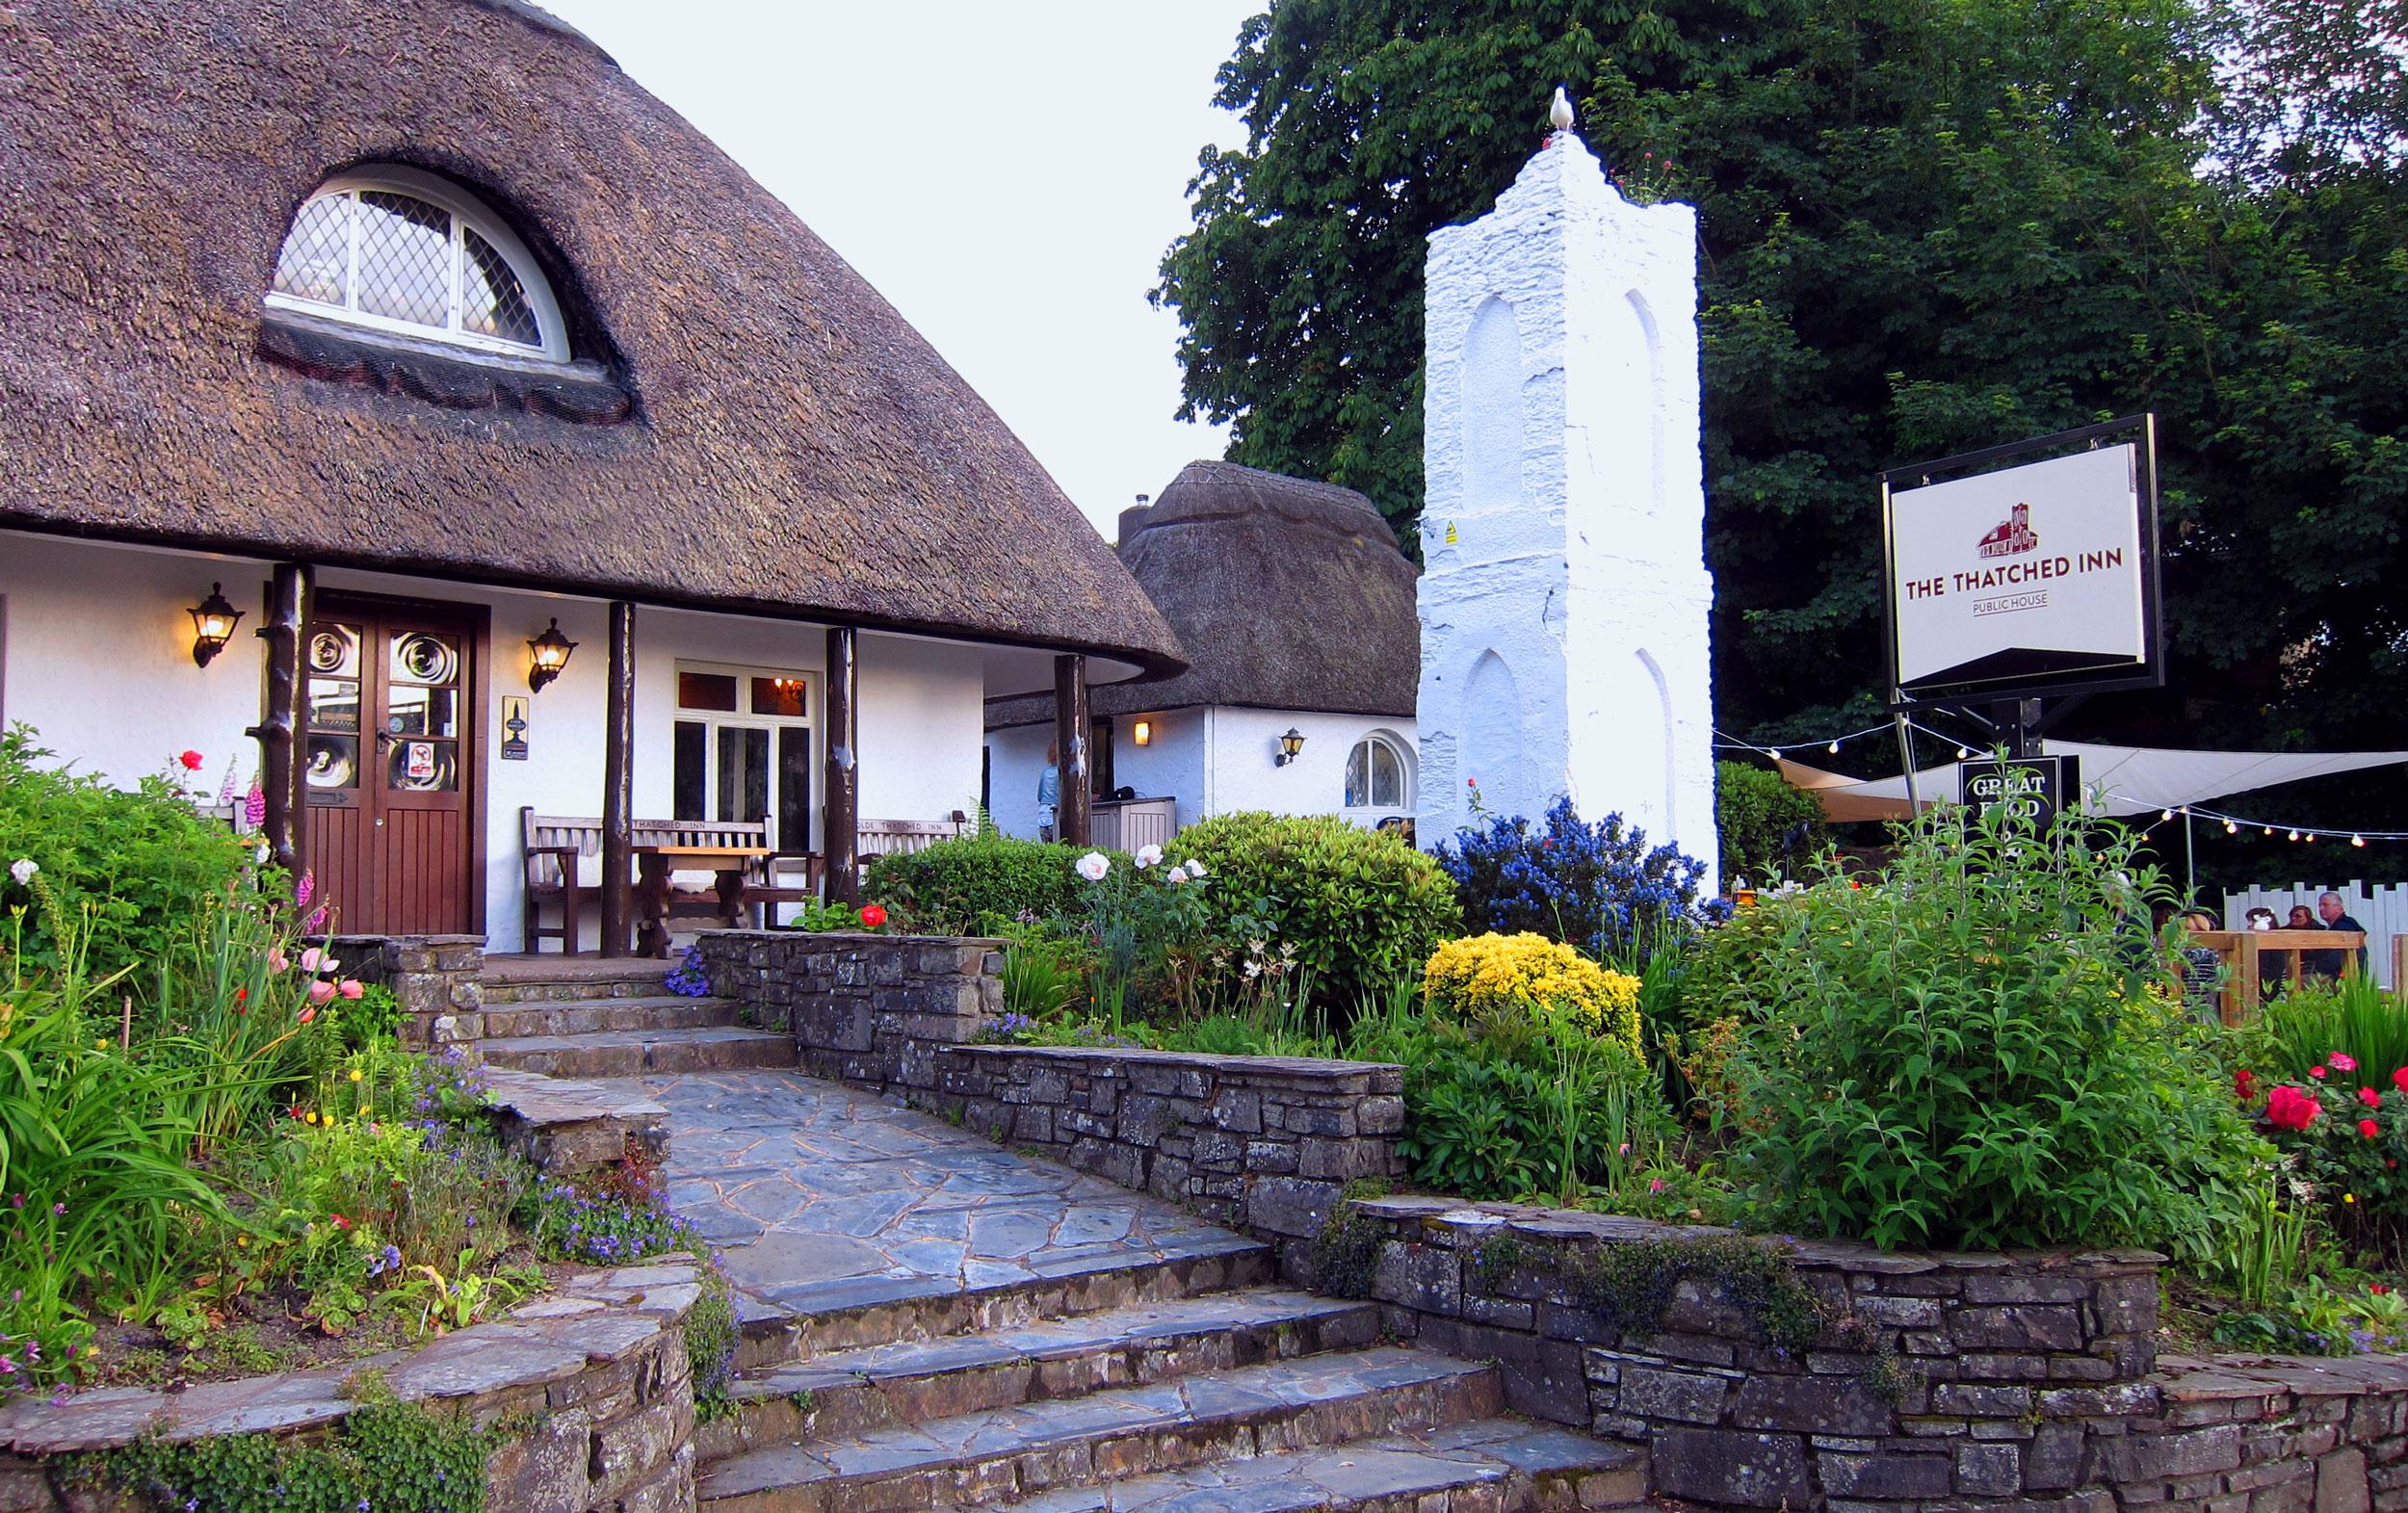 The-Thatched-Inn-Sunday-Ilfracombe.jpg